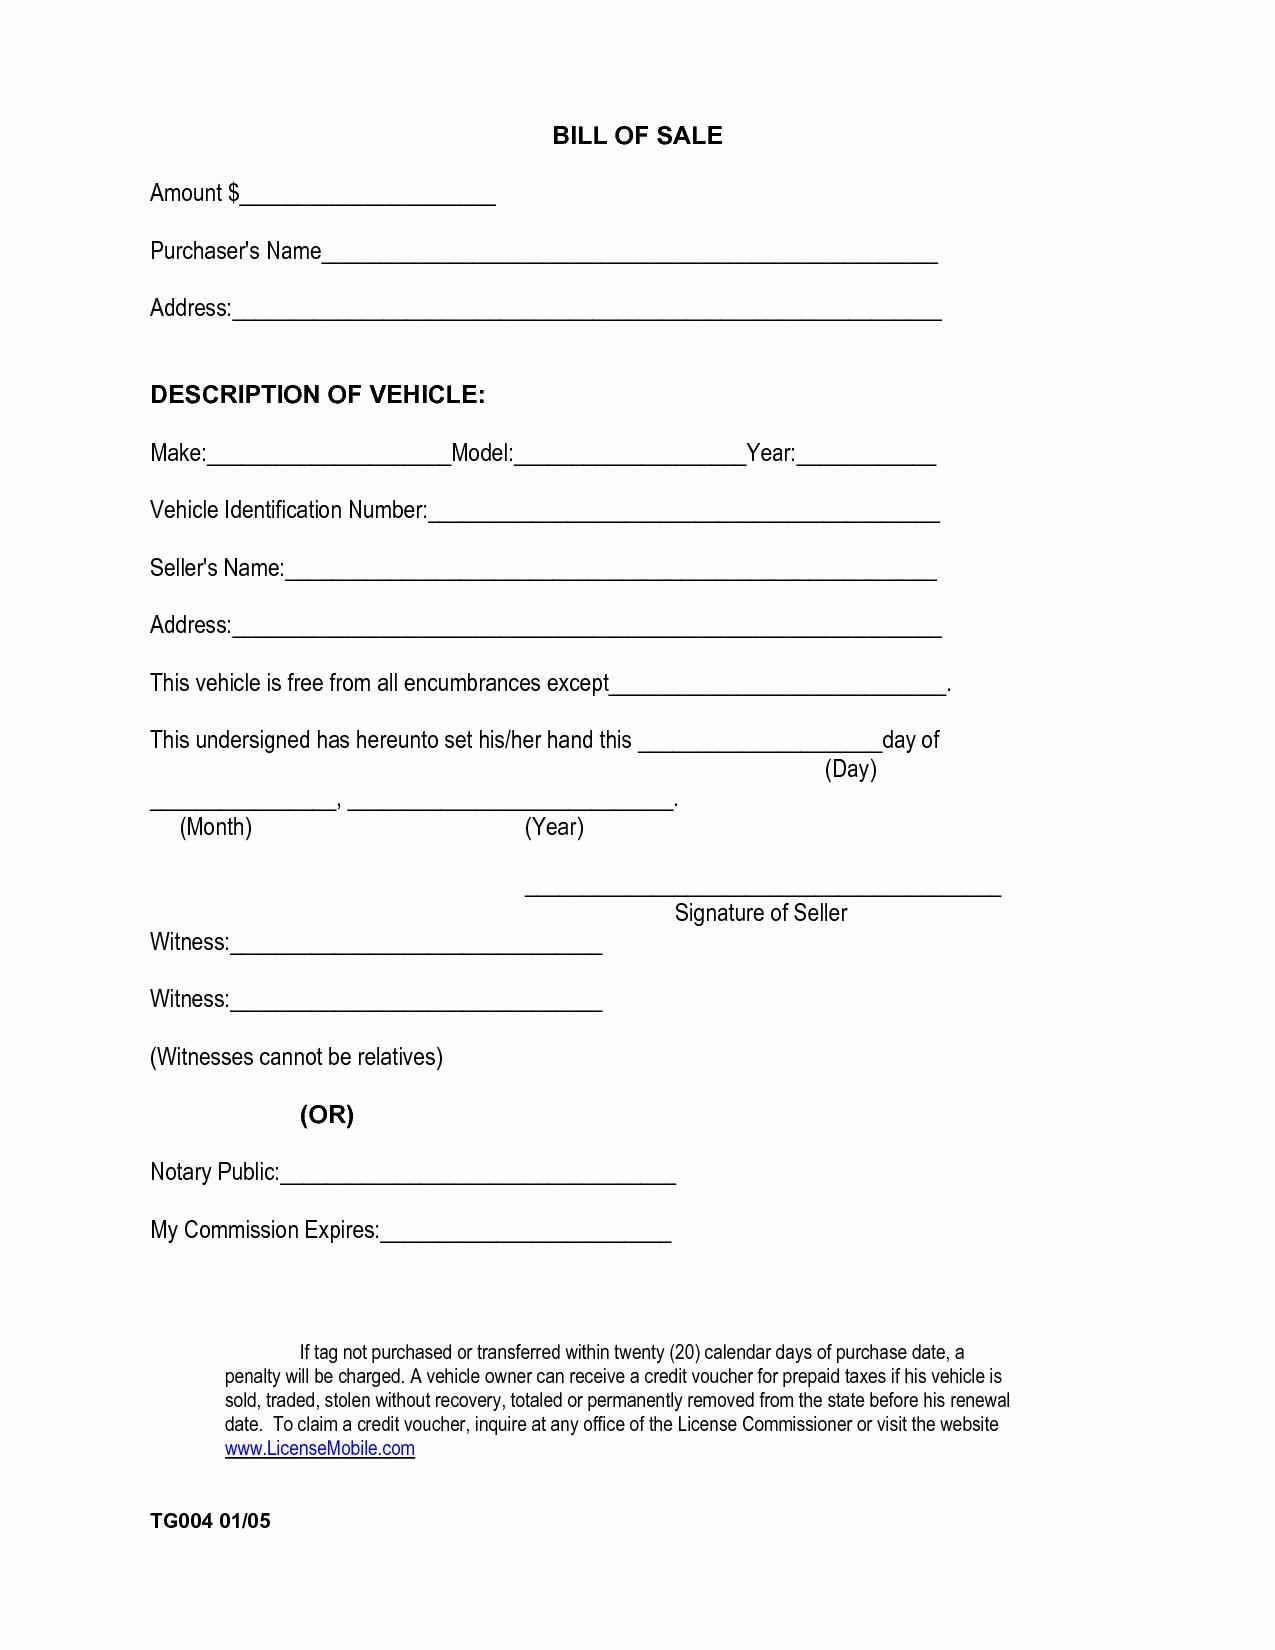 Print Free Bill Of Sale Luxury Printable Sample Car Bill Of Sale form